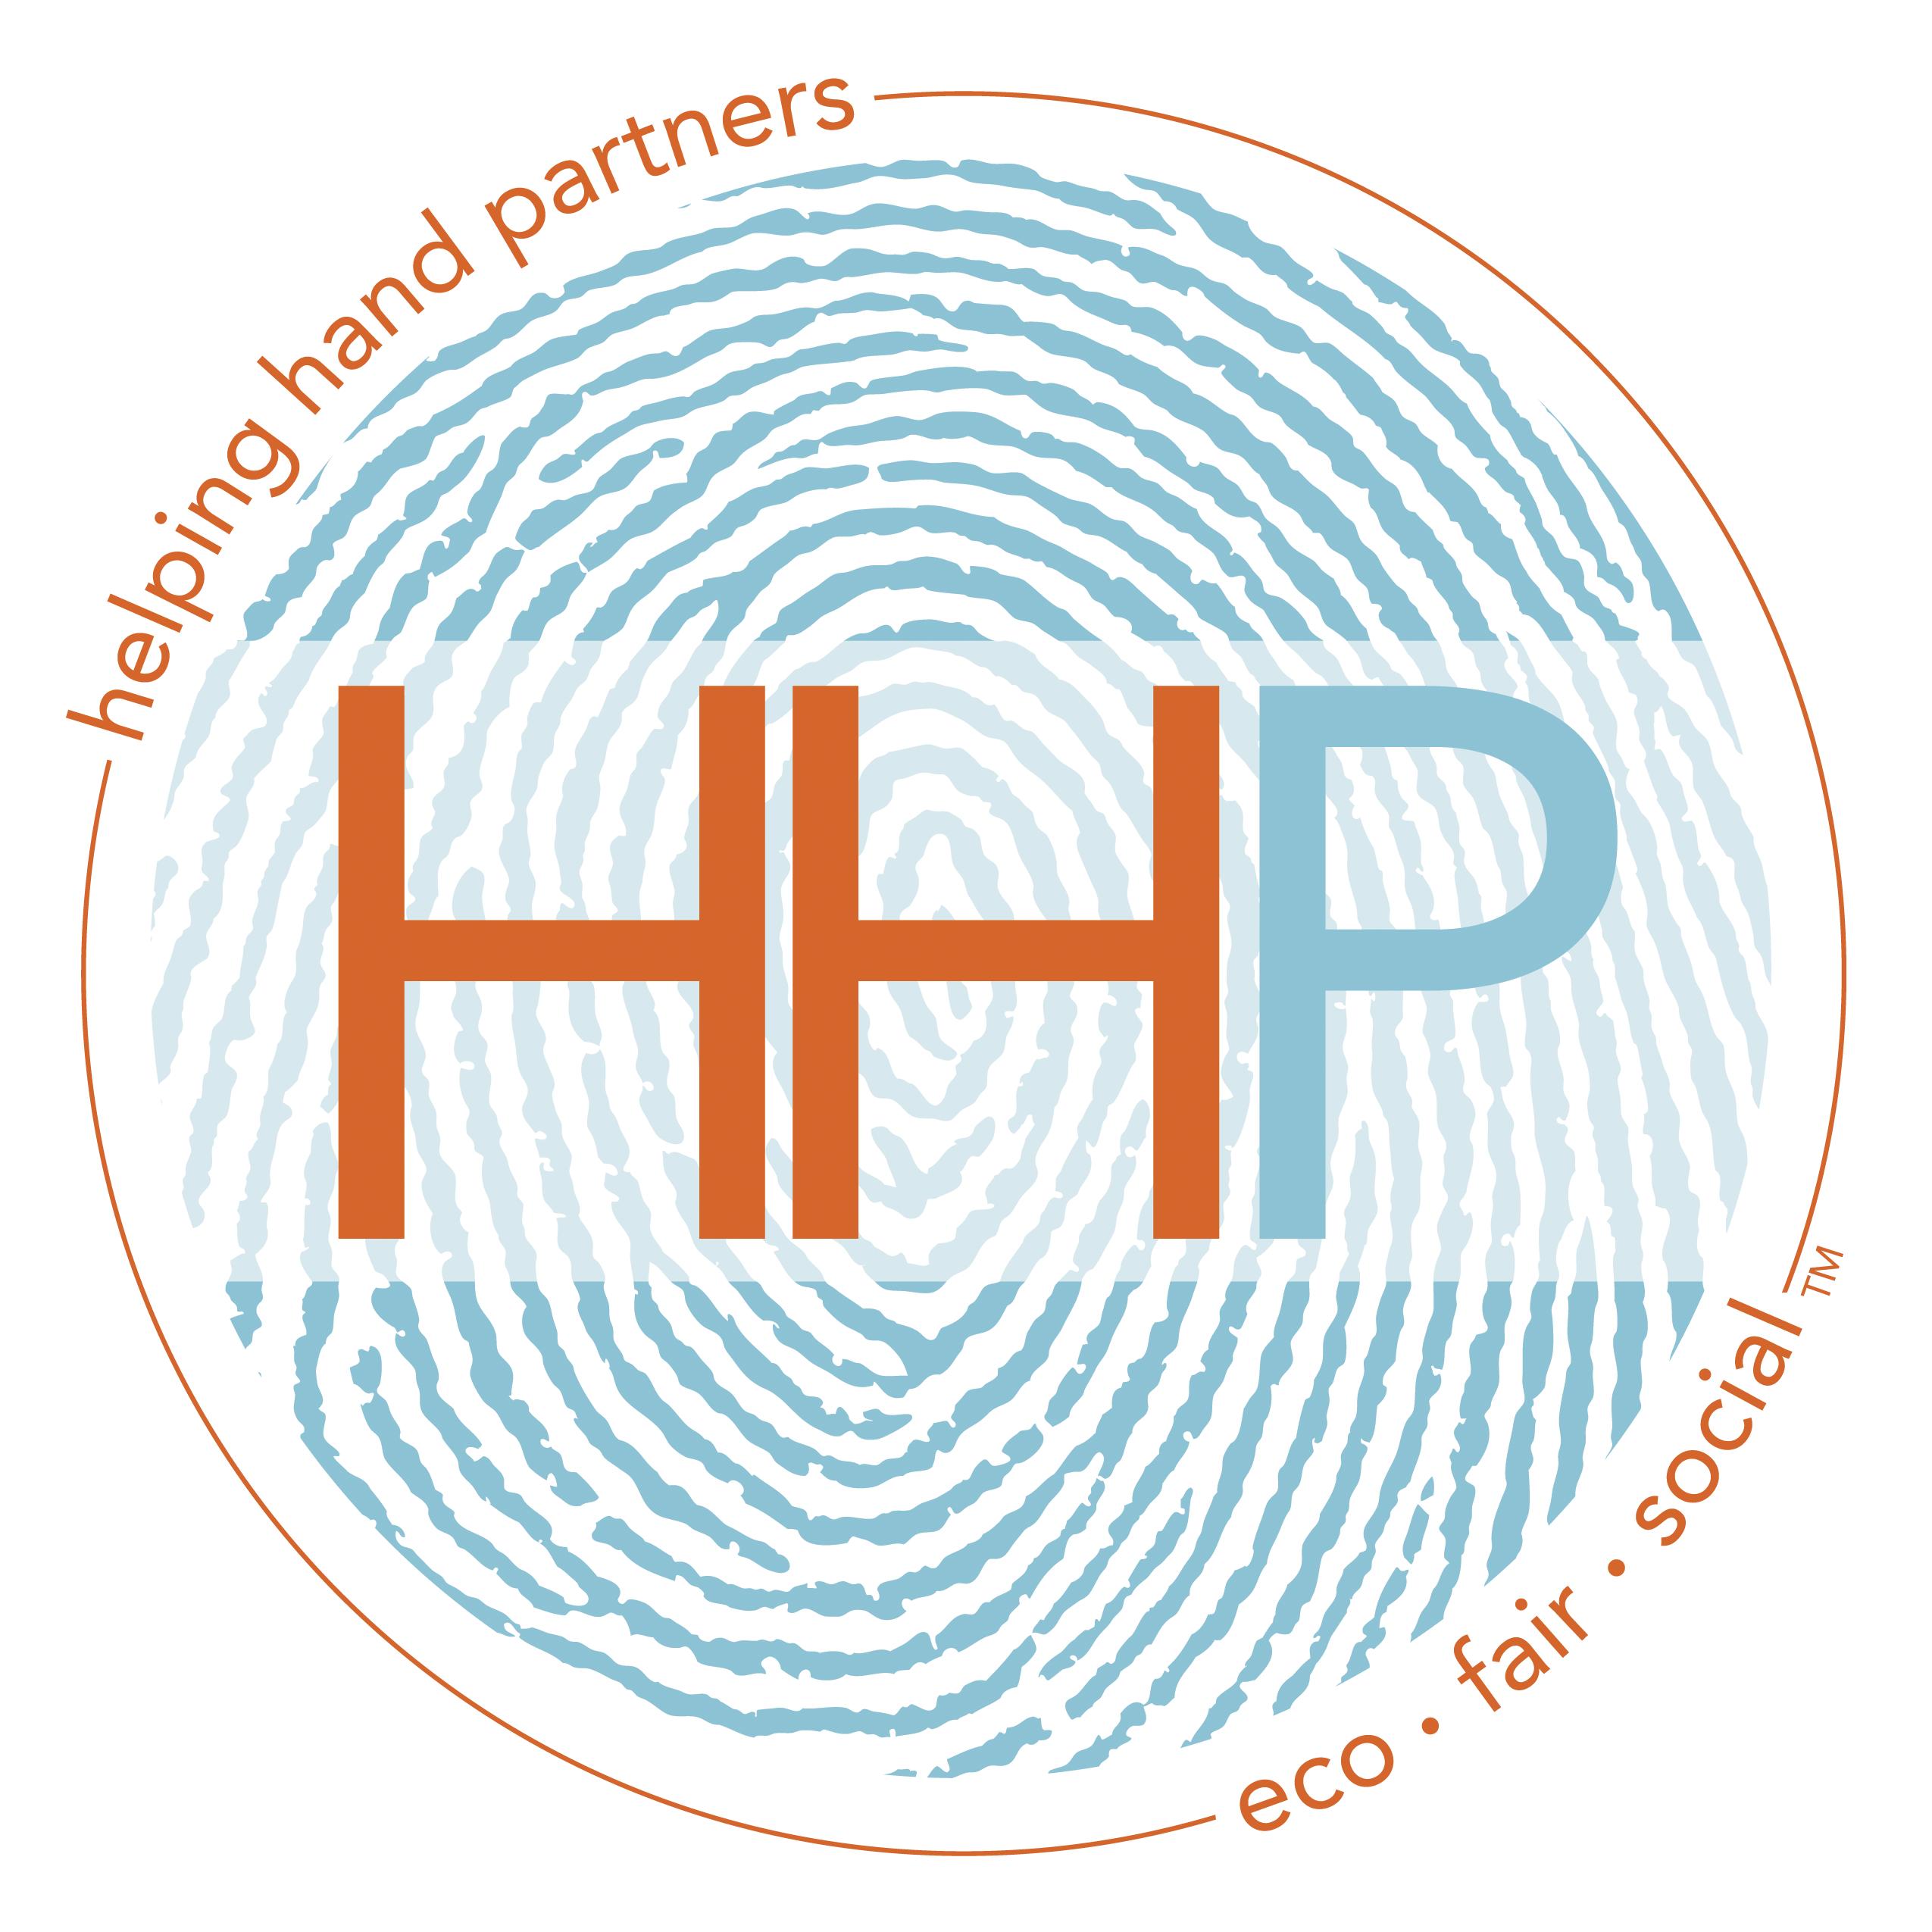 Helping Hands Partners